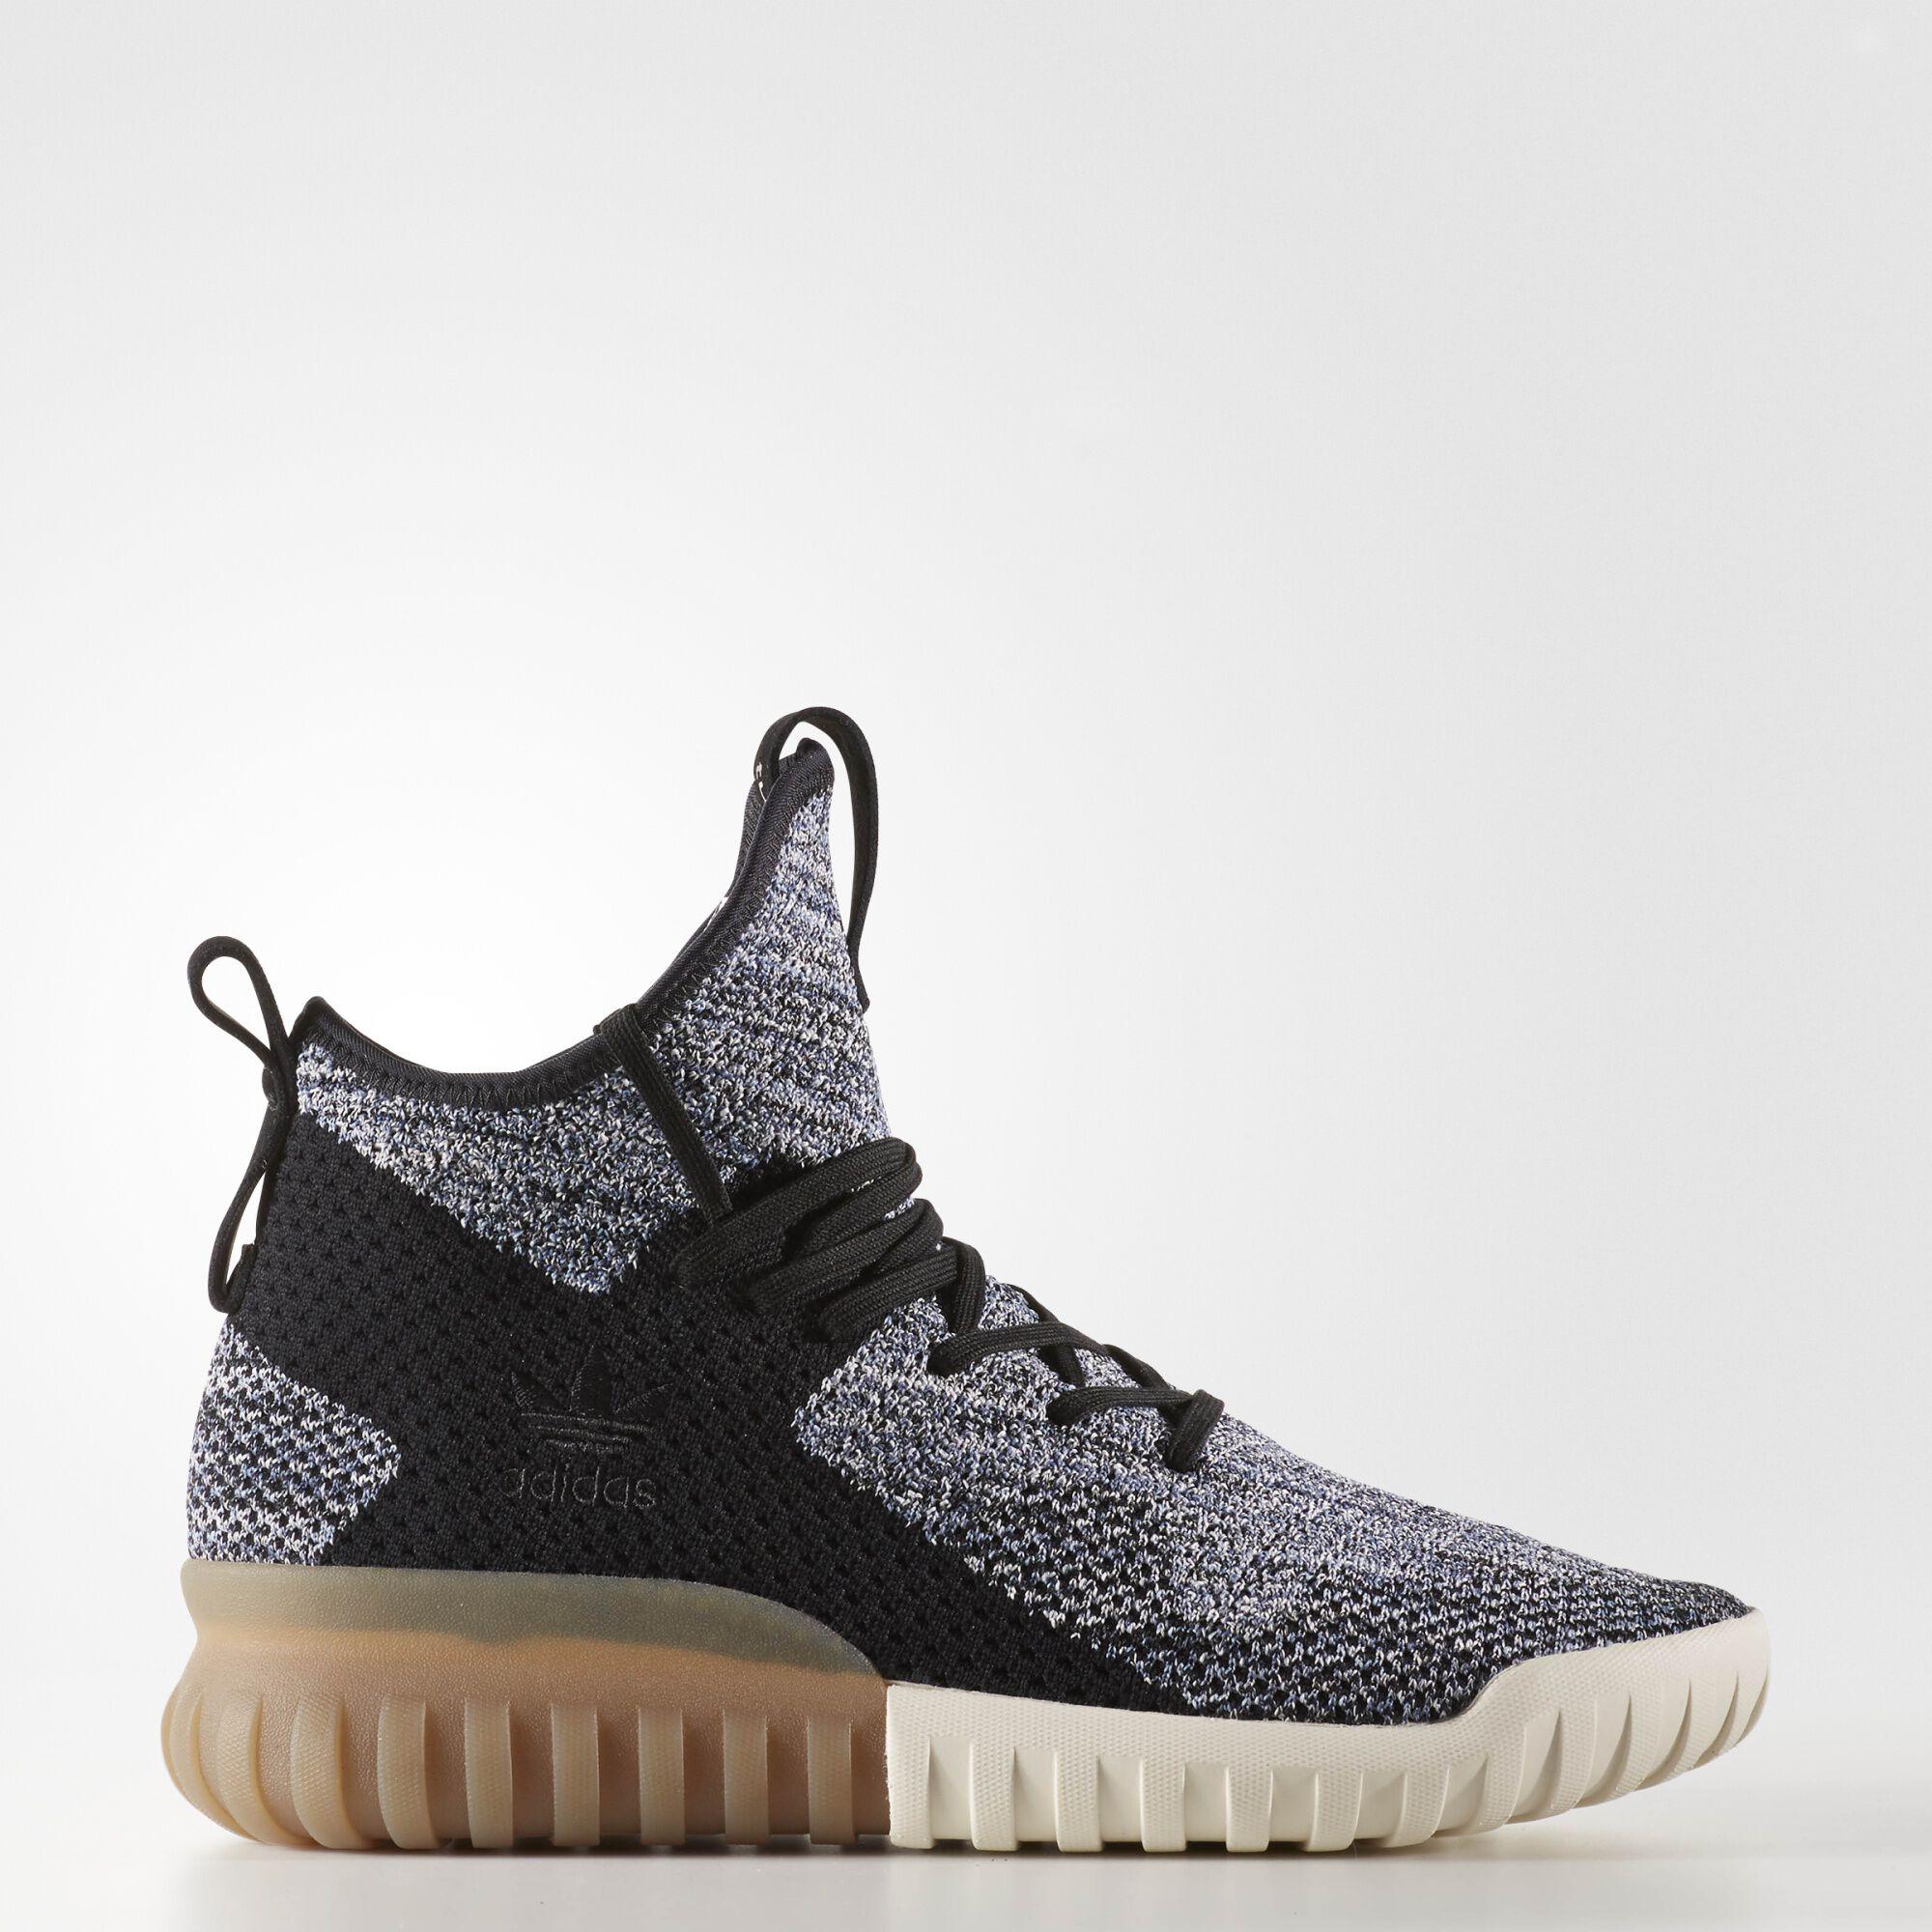 adidas-Tubular-X-Primeknit-Shoes-Men-039-s-Black